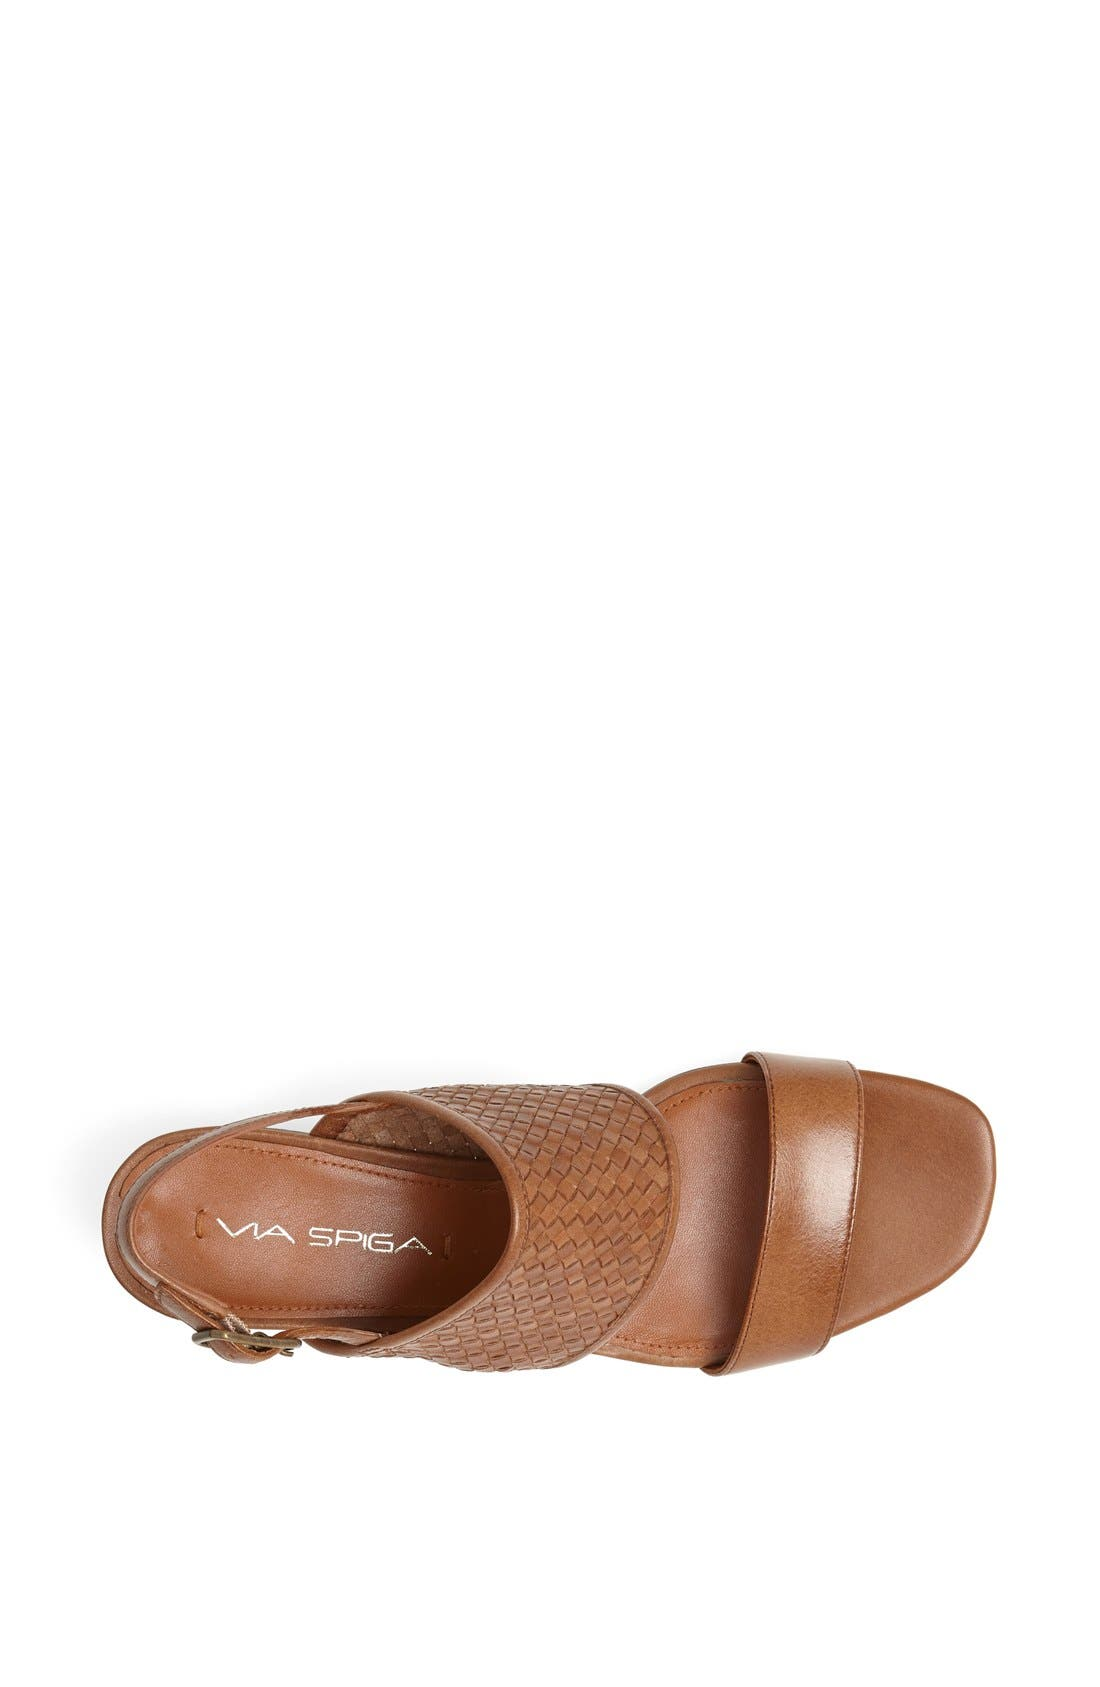 Alternate Image 3  - Via Spiga 'Cairo2' Leather Sandal